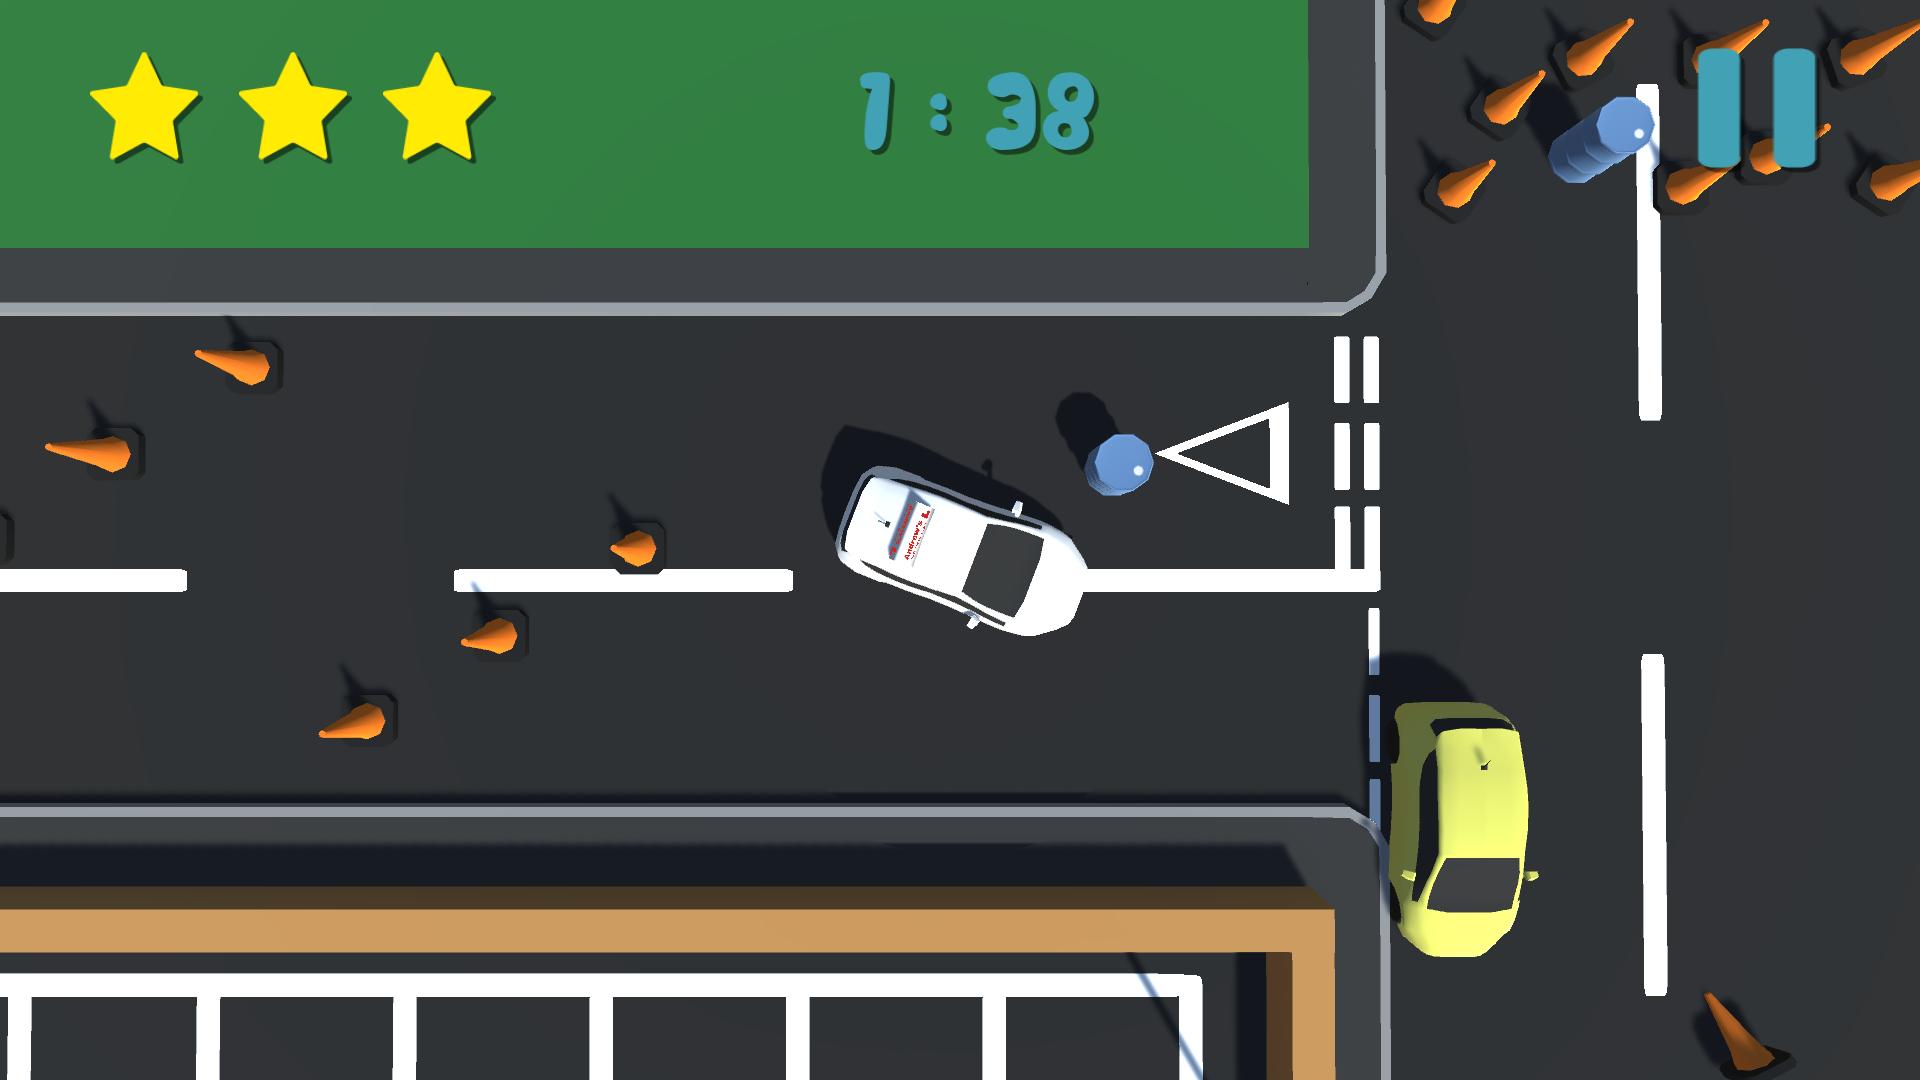 Parking Game - Andrew's Driving School